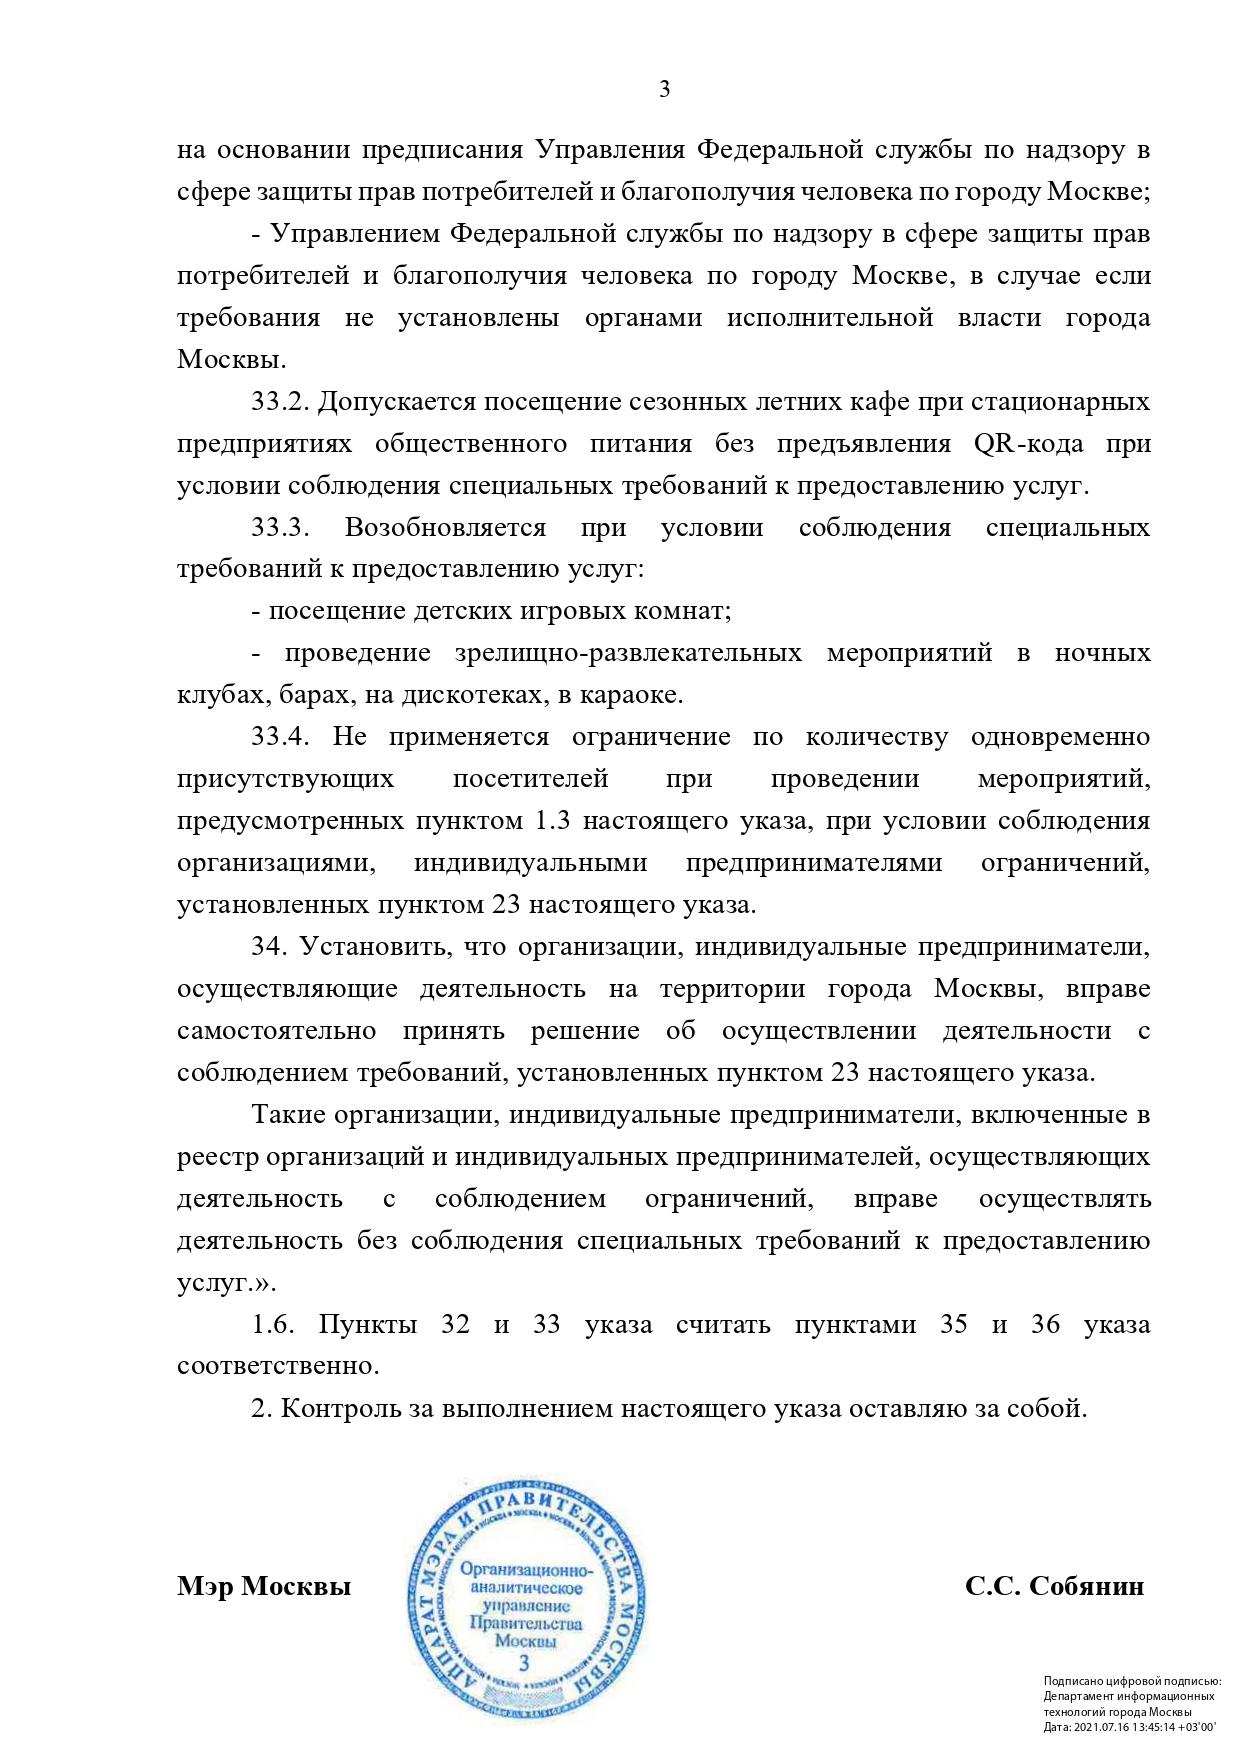 Указ Мэра Москвы Собянина С.С. от 16 июля 2021 г. (16.07.2021) No 42-УМ 3